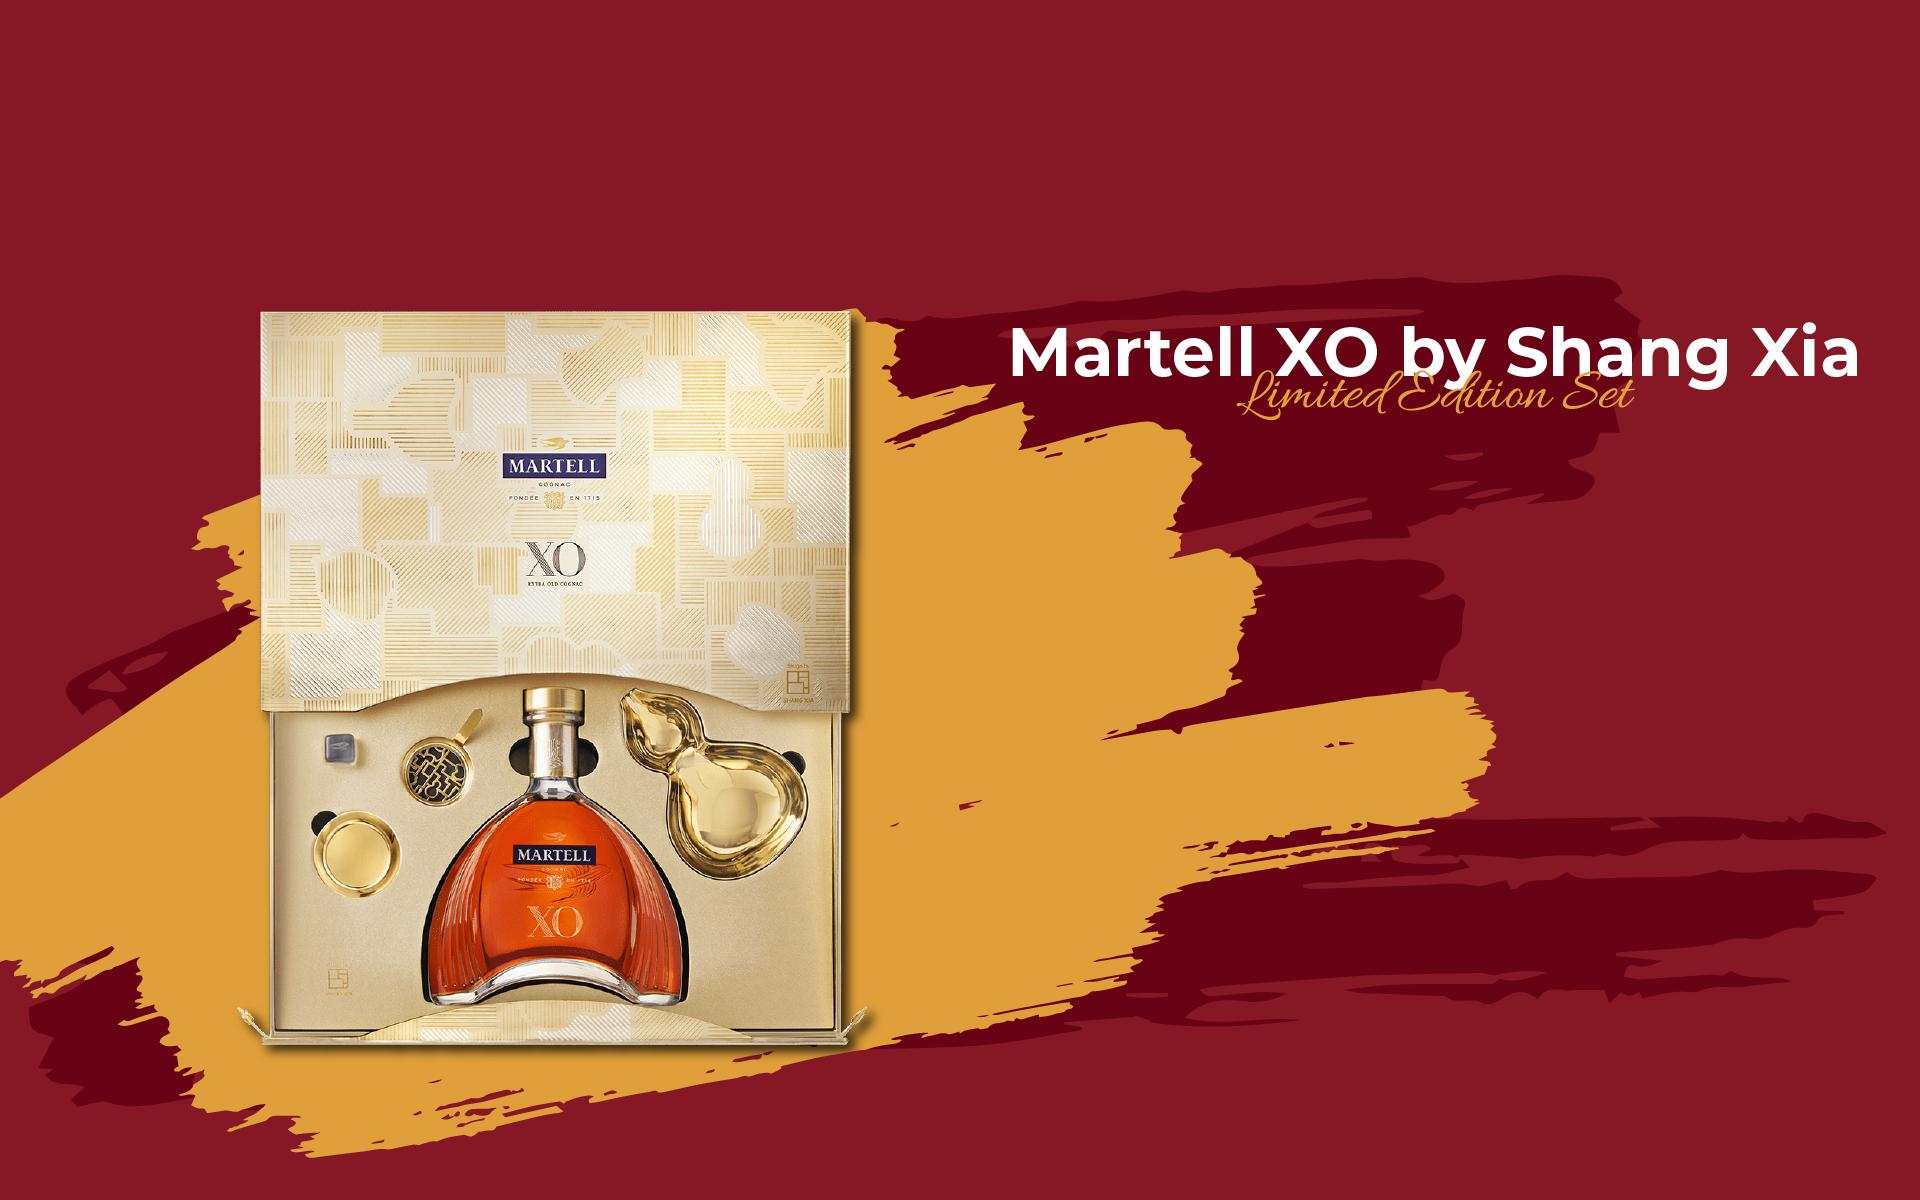 Audacious spirit of Maison Martell